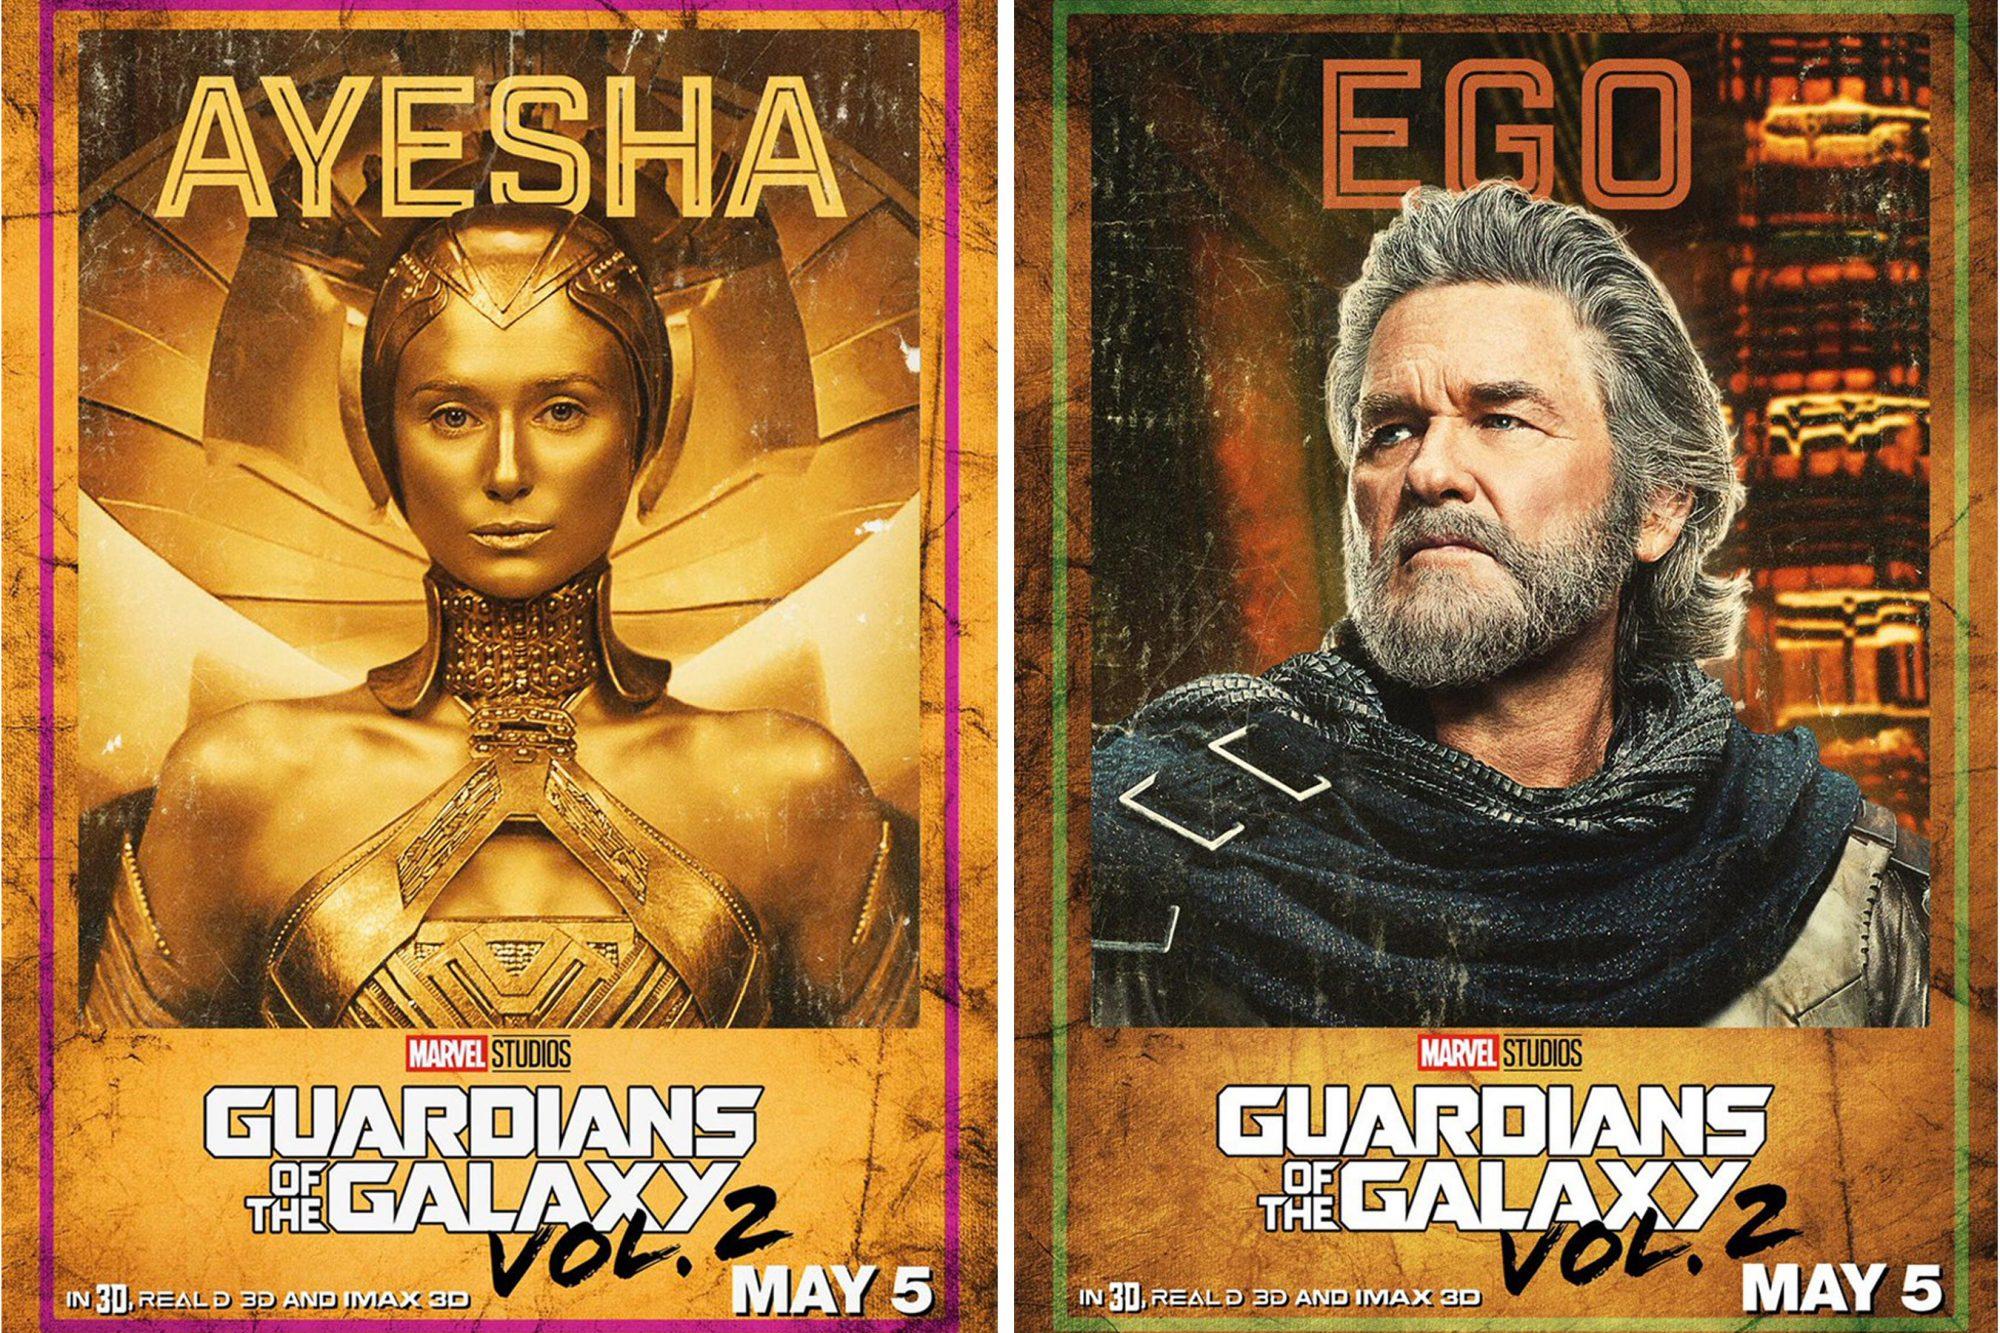 Guardians of the Galaxy 2 - Ayesha & Ego